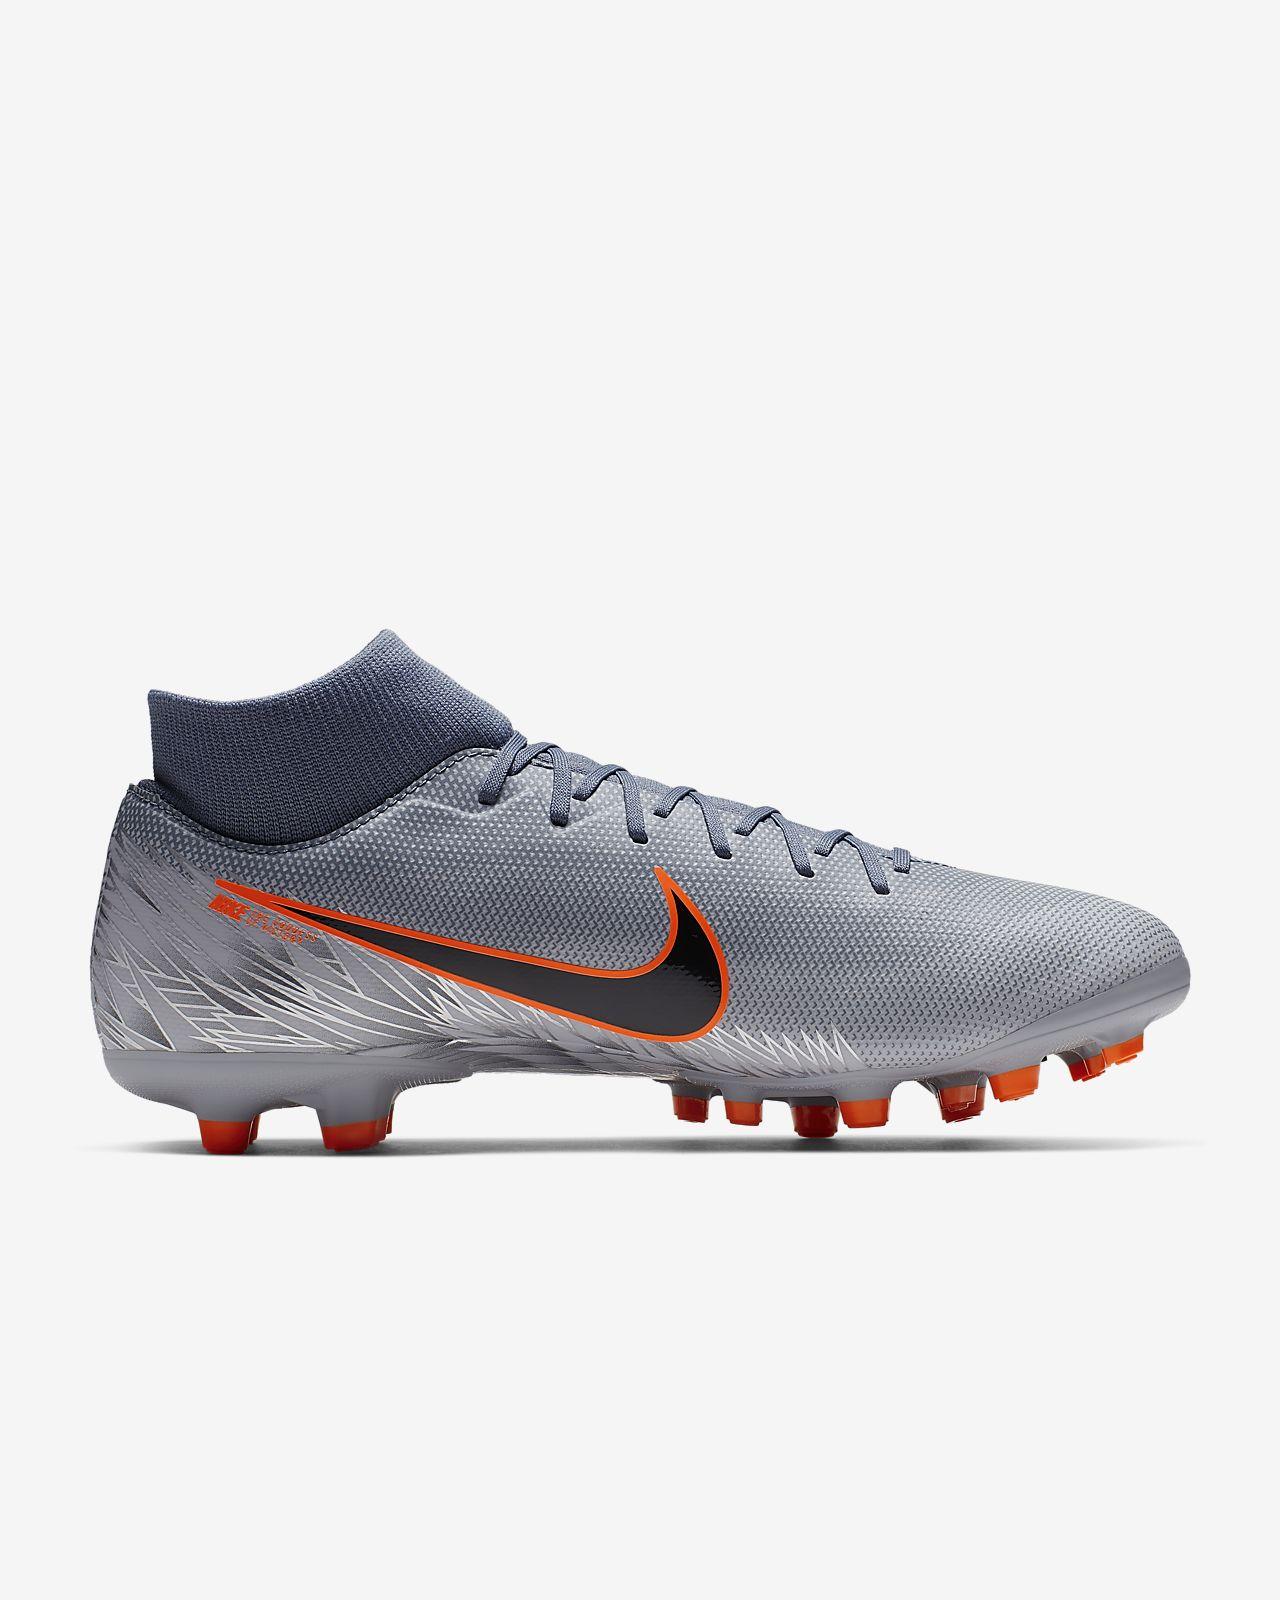 25a68e9a5f ... Chuteiras de futebol multiterreno Nike Mercurial Superfly 6 Academy MG